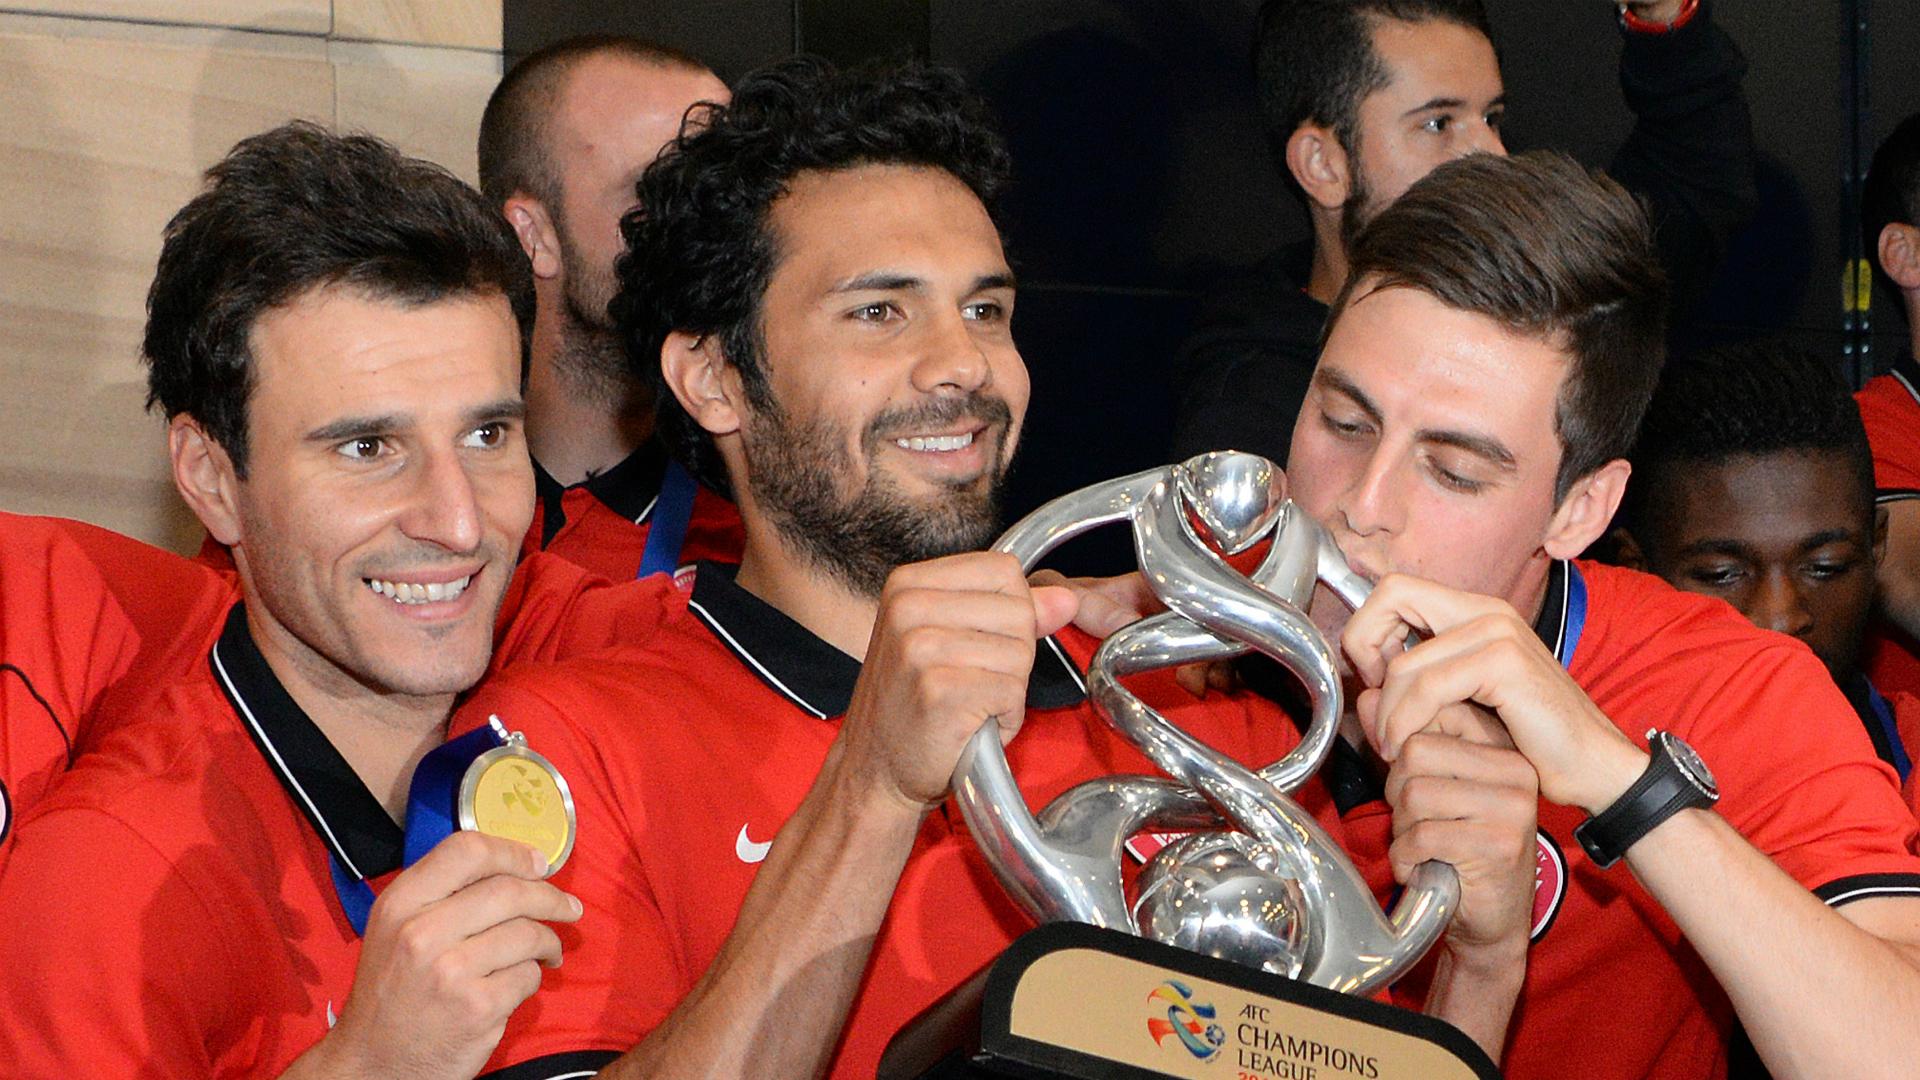 Nikolai Topor-Stanley Western Sydney Wanderers AFC Champions League 03112014